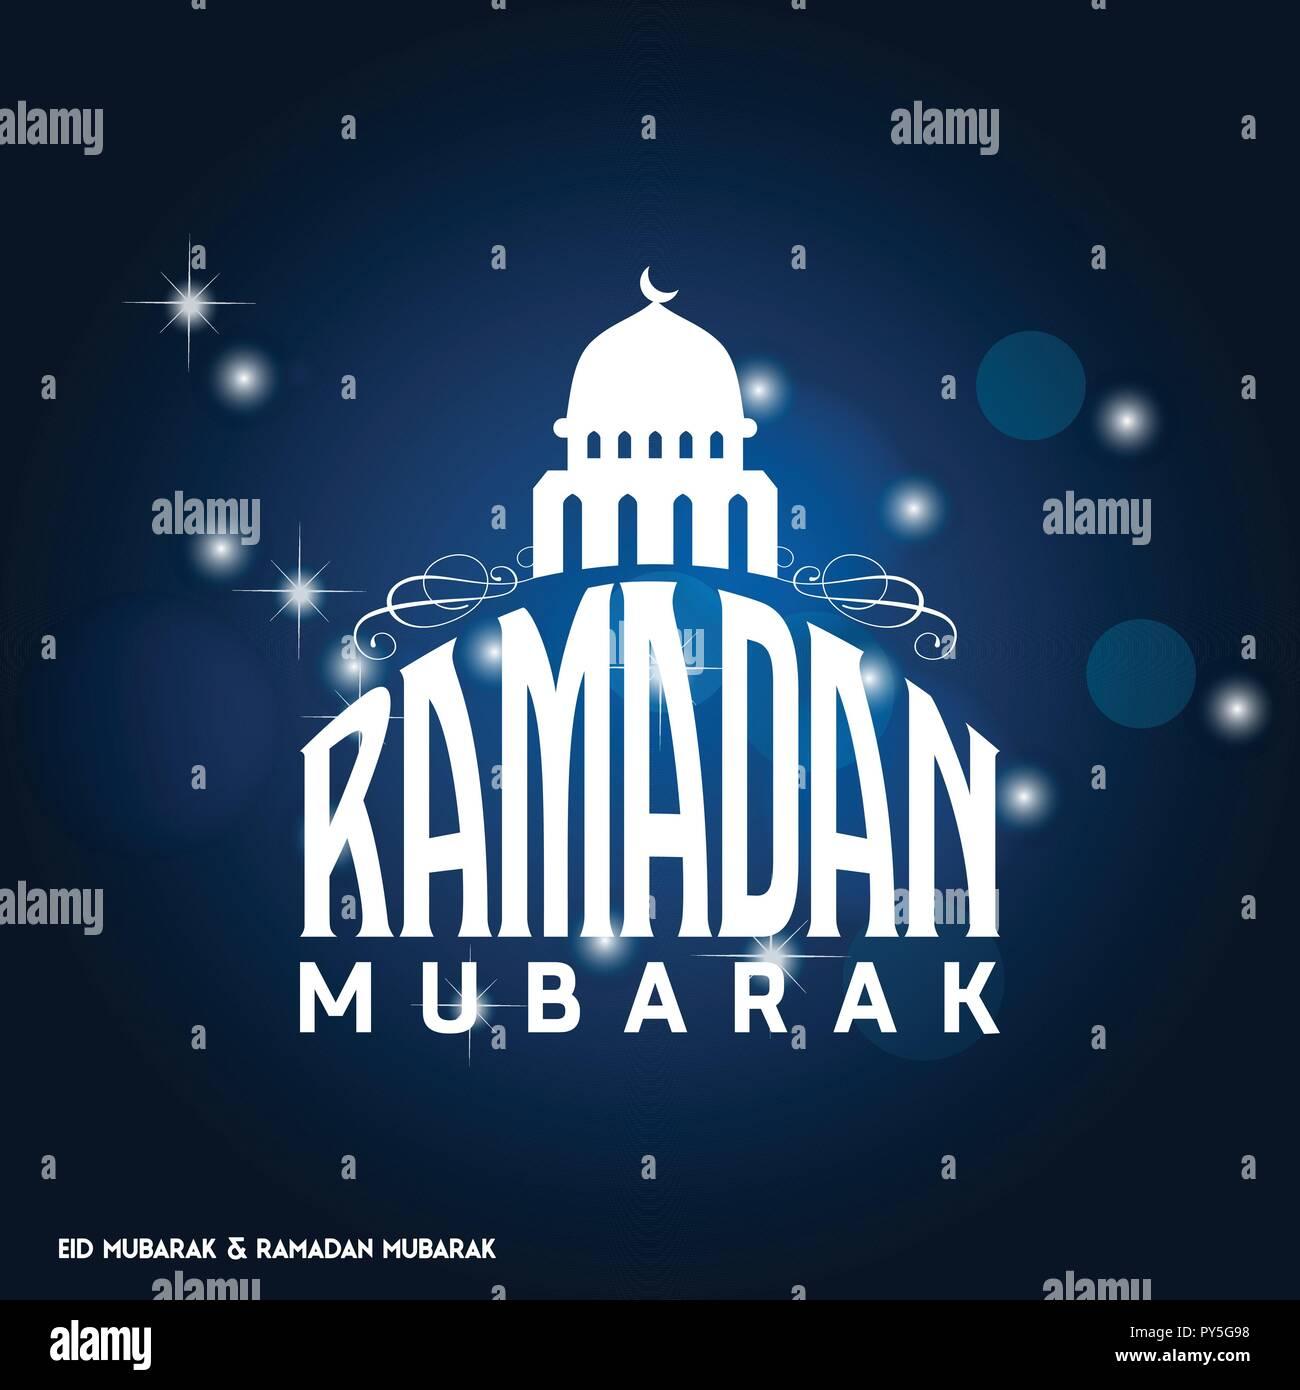 Ramadan Mubarak Simple Typography With Moon On Dark Blue Background Stock Vector Image Art Alamy